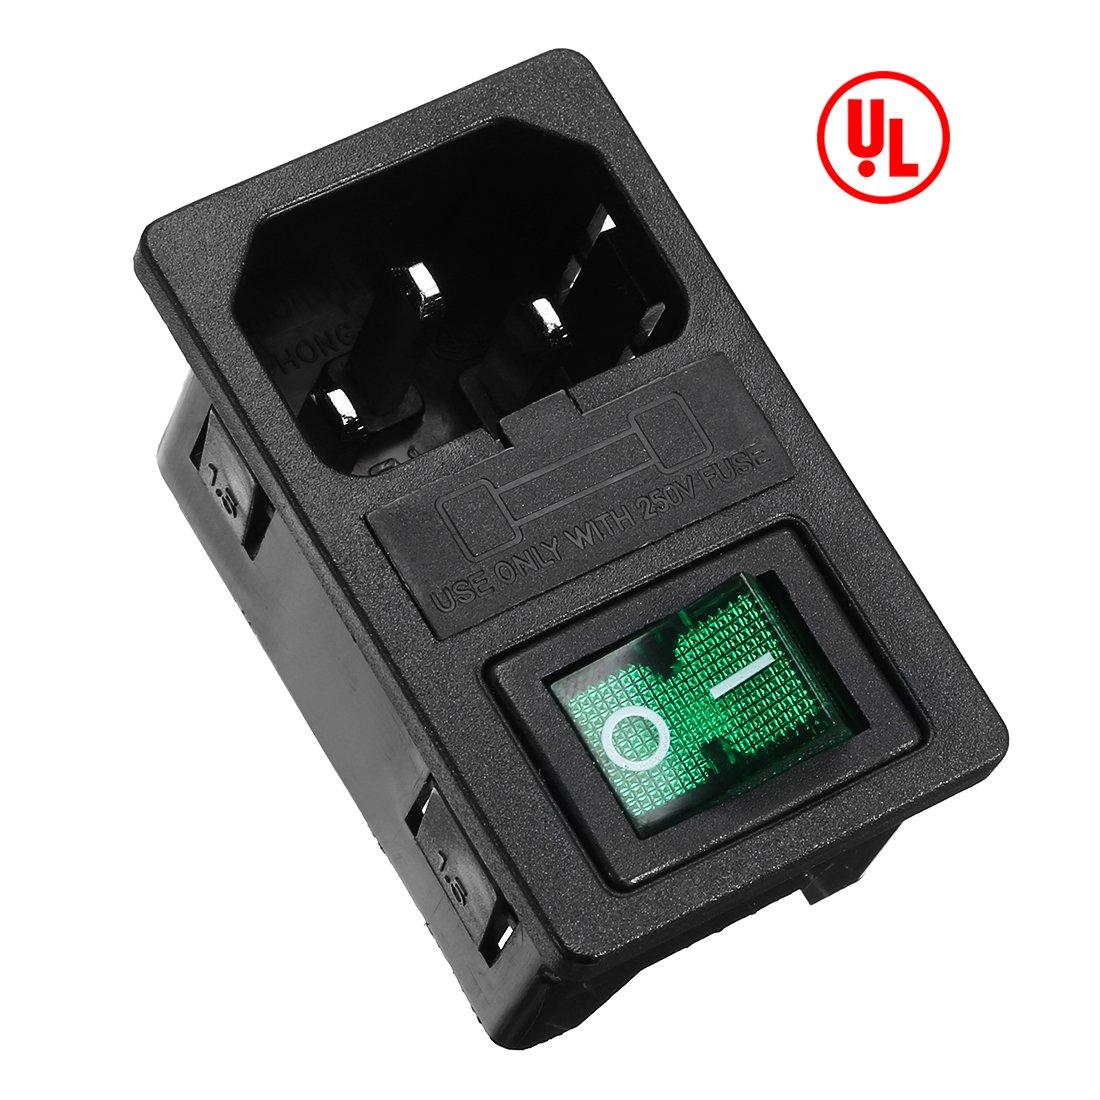 Amazon.com: uxcell Green Rocker Switch Fuse Holer IEC320 C14 4P DPST ...